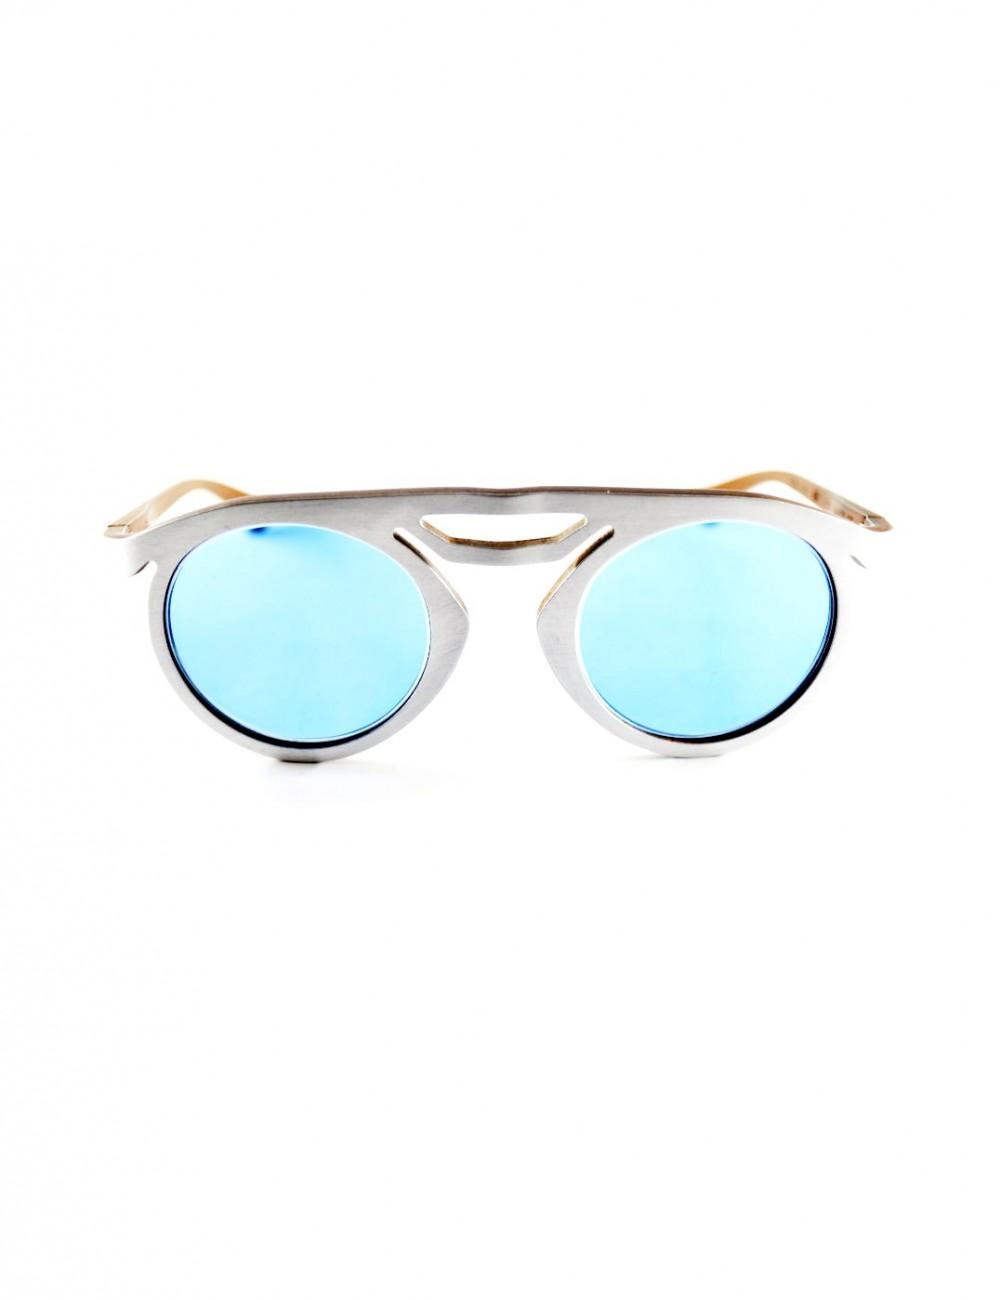 W-eye W-eye A8 s3 m01h smoked ch (unique piece)  EyewearShop